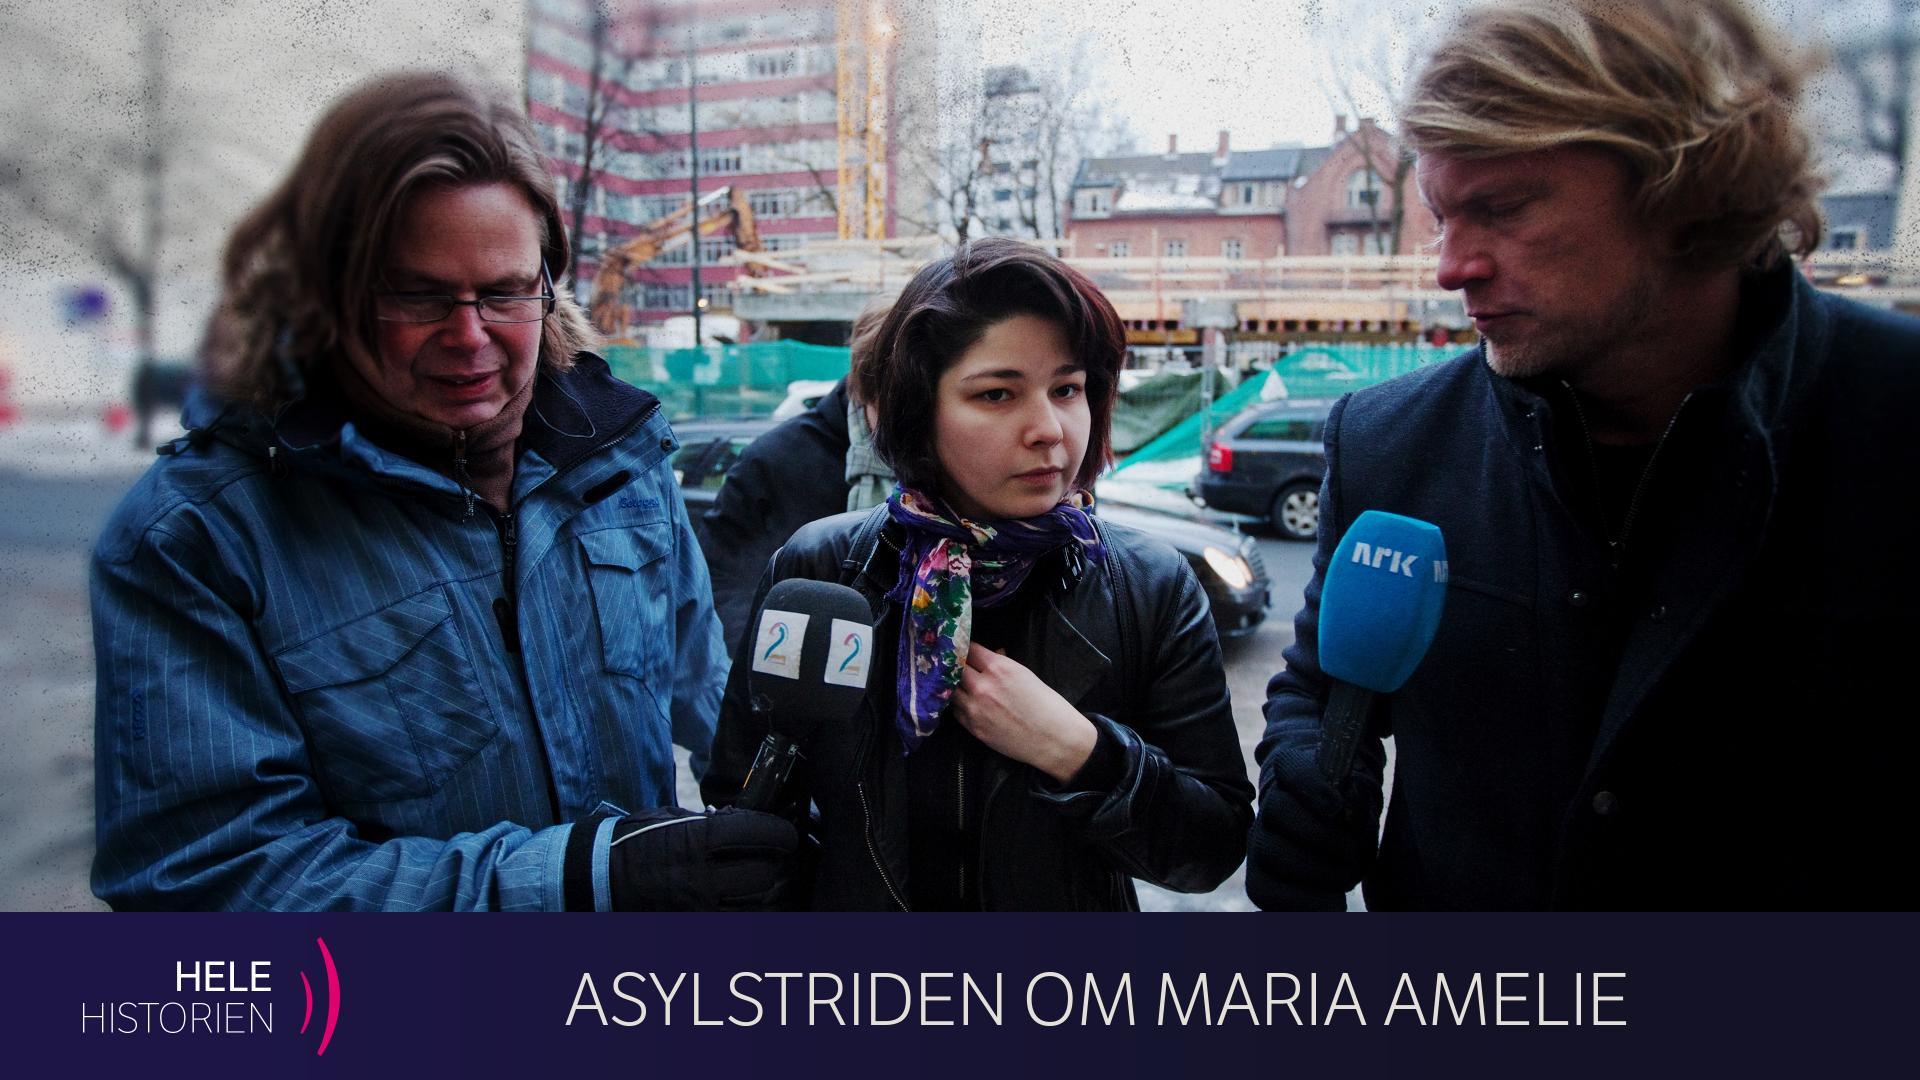 HELE HISTORIEN: ASYLSTRIDEN OM MARIA AMELIE